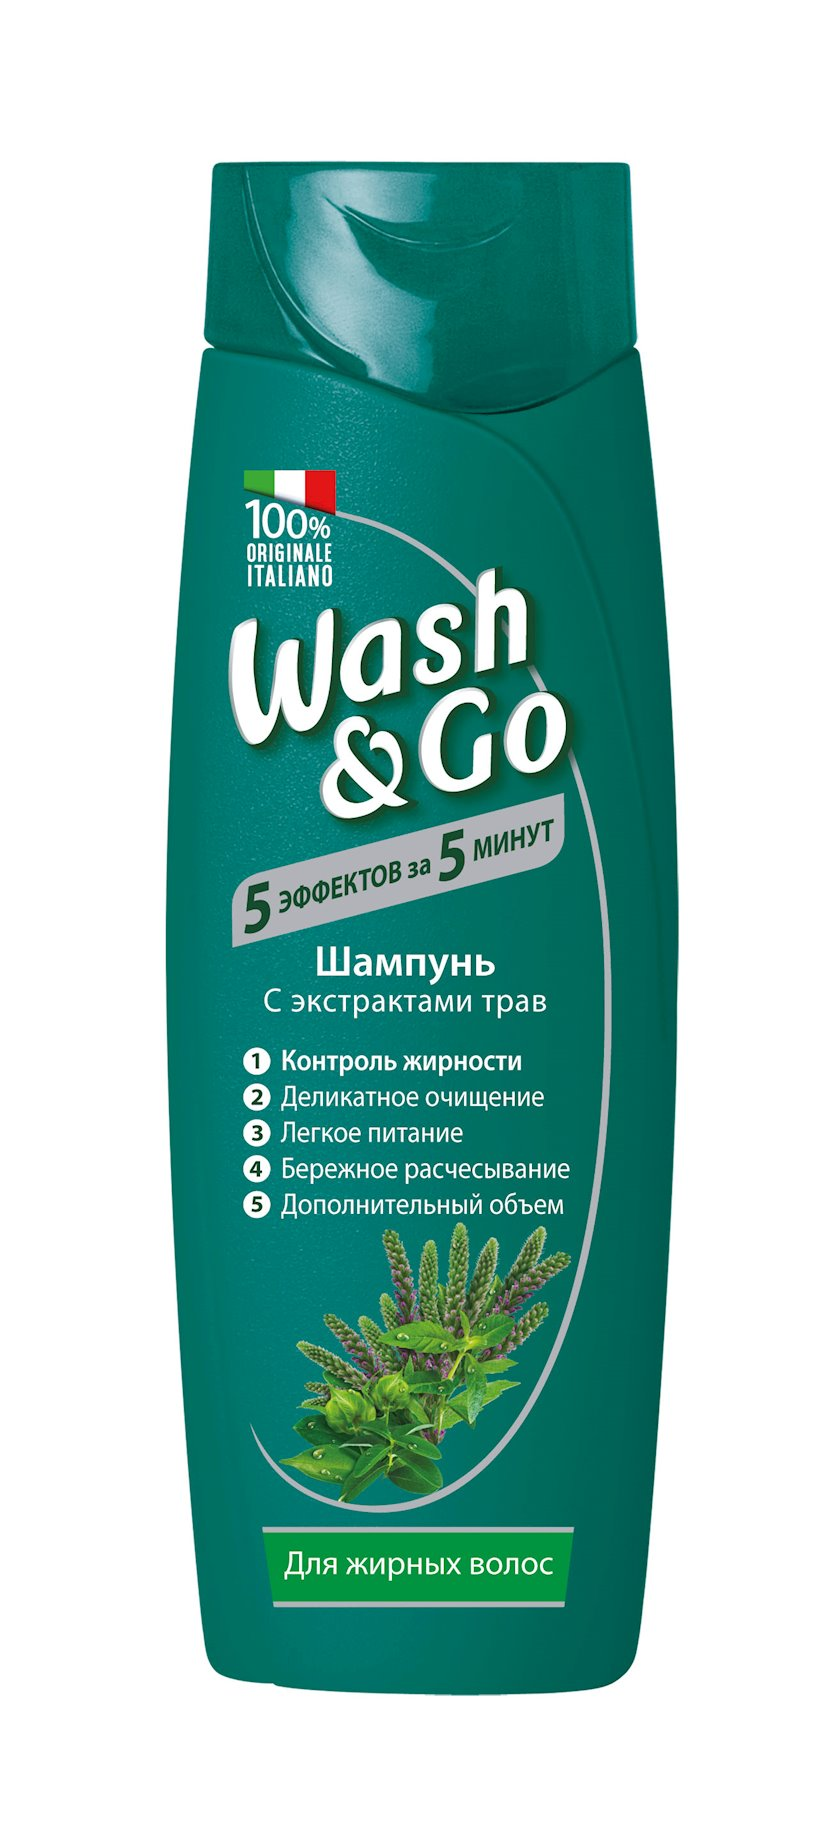 Şampun Wash&Go Herbal yağlı saçlar üçün 200 ml